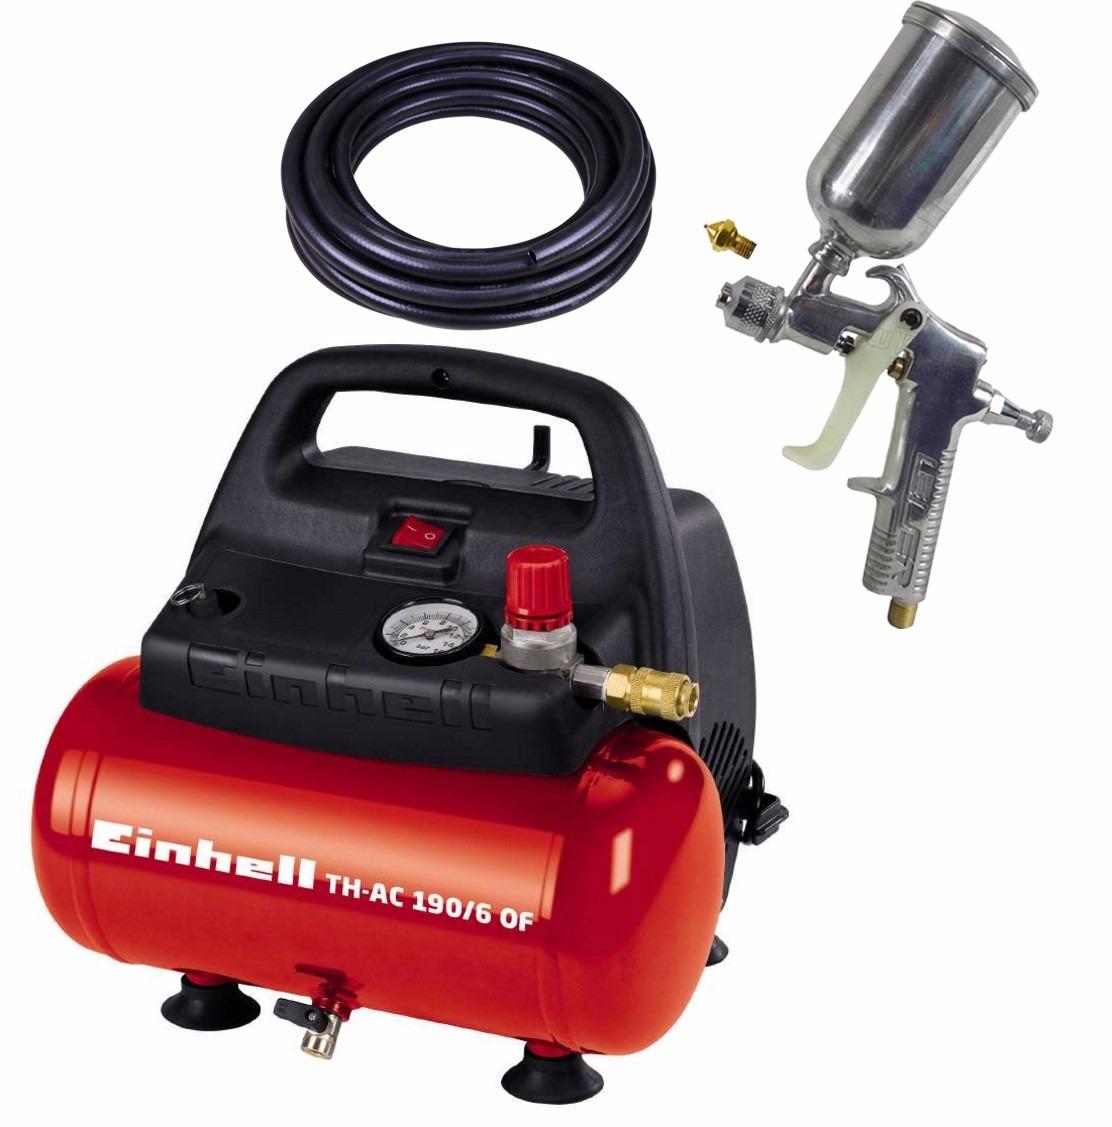 Compressor 110v 6l th ac190 6 of einhell kit pintura r - Compresor 6 litros ...